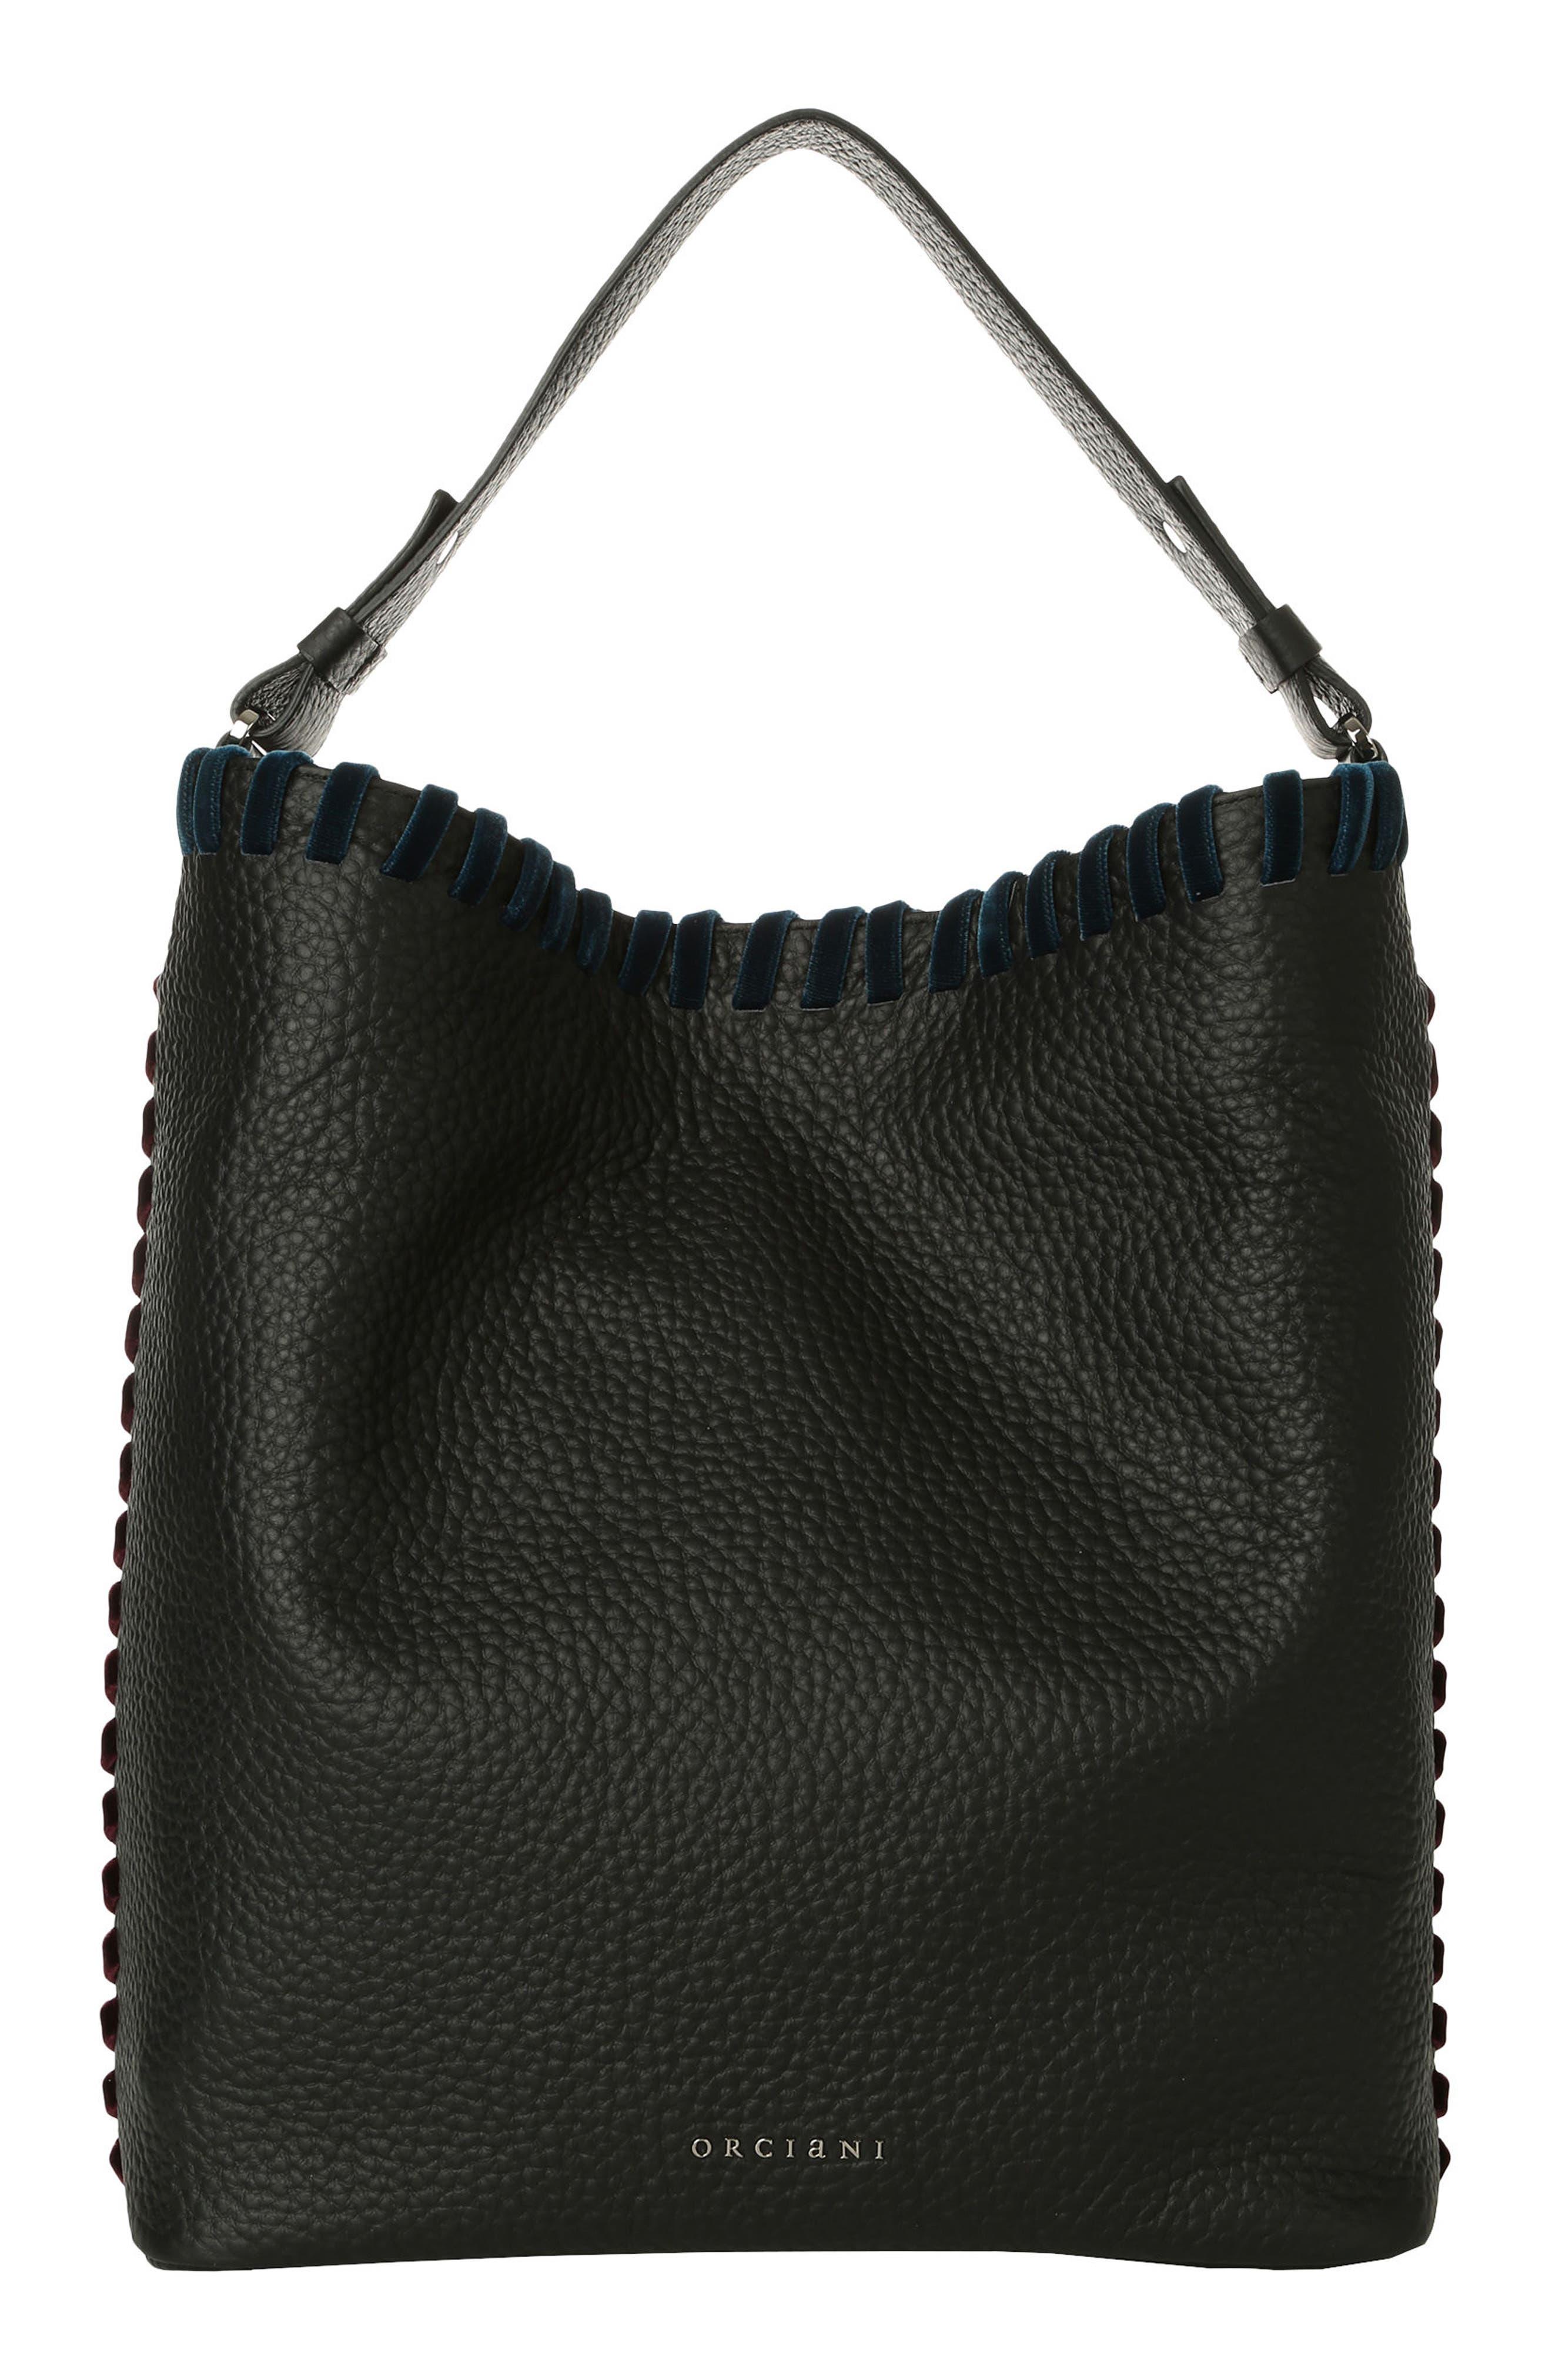 Orciani Noona Velvet Trim Calfskin Leather Tote